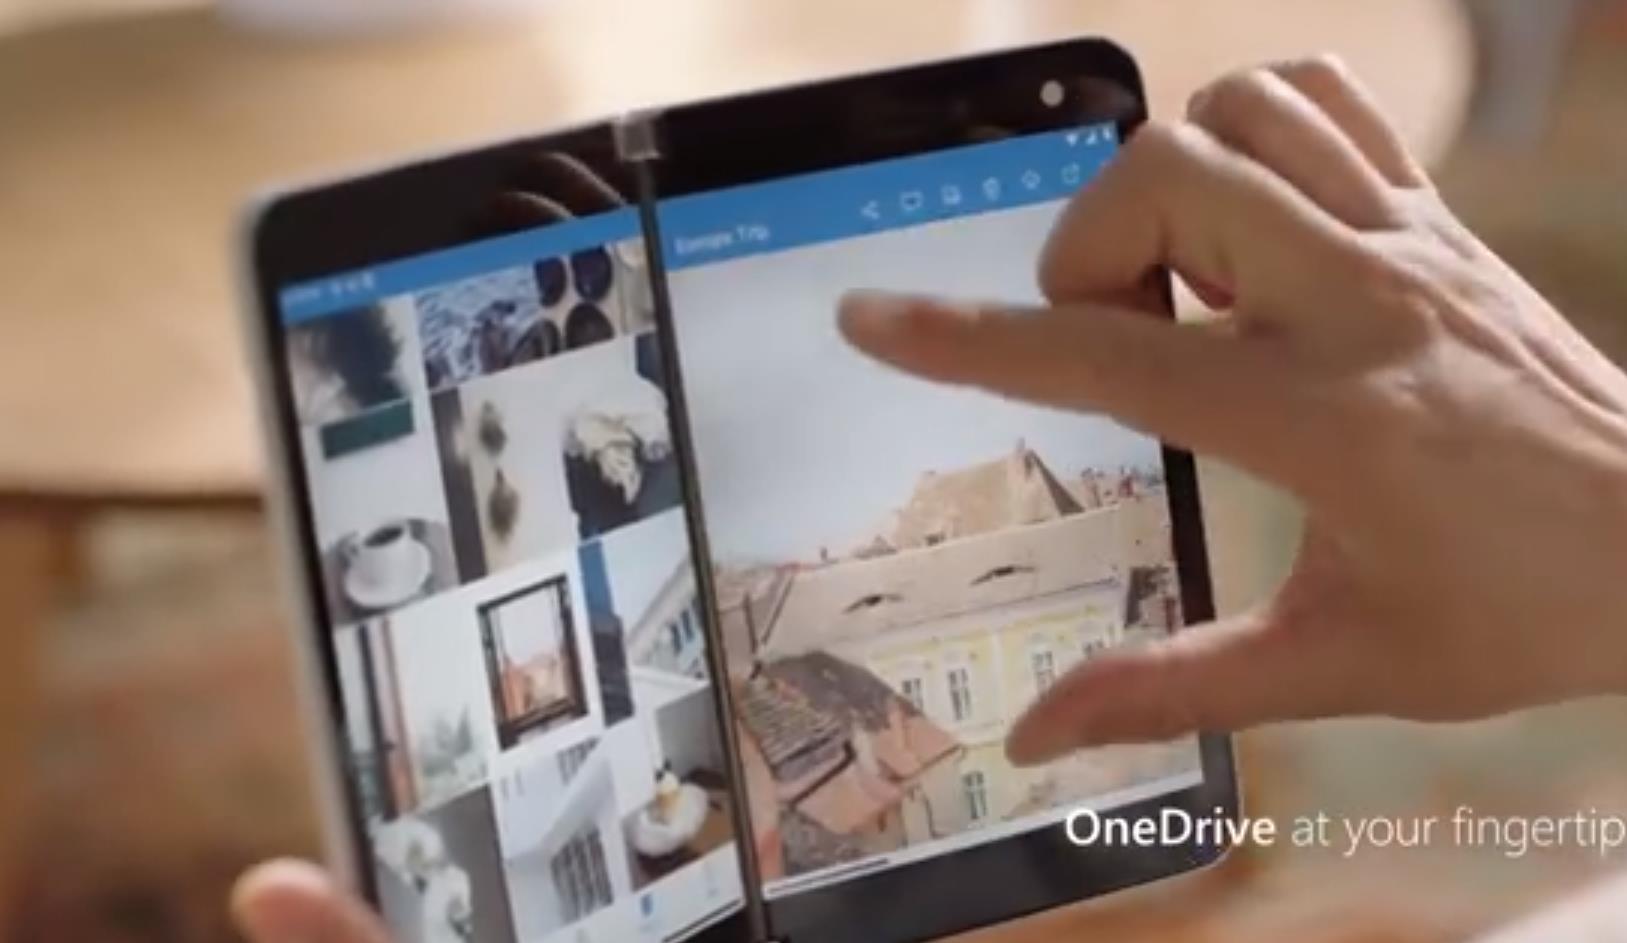 微软Surface Duo双屏手机官宣:9月10日正式发售